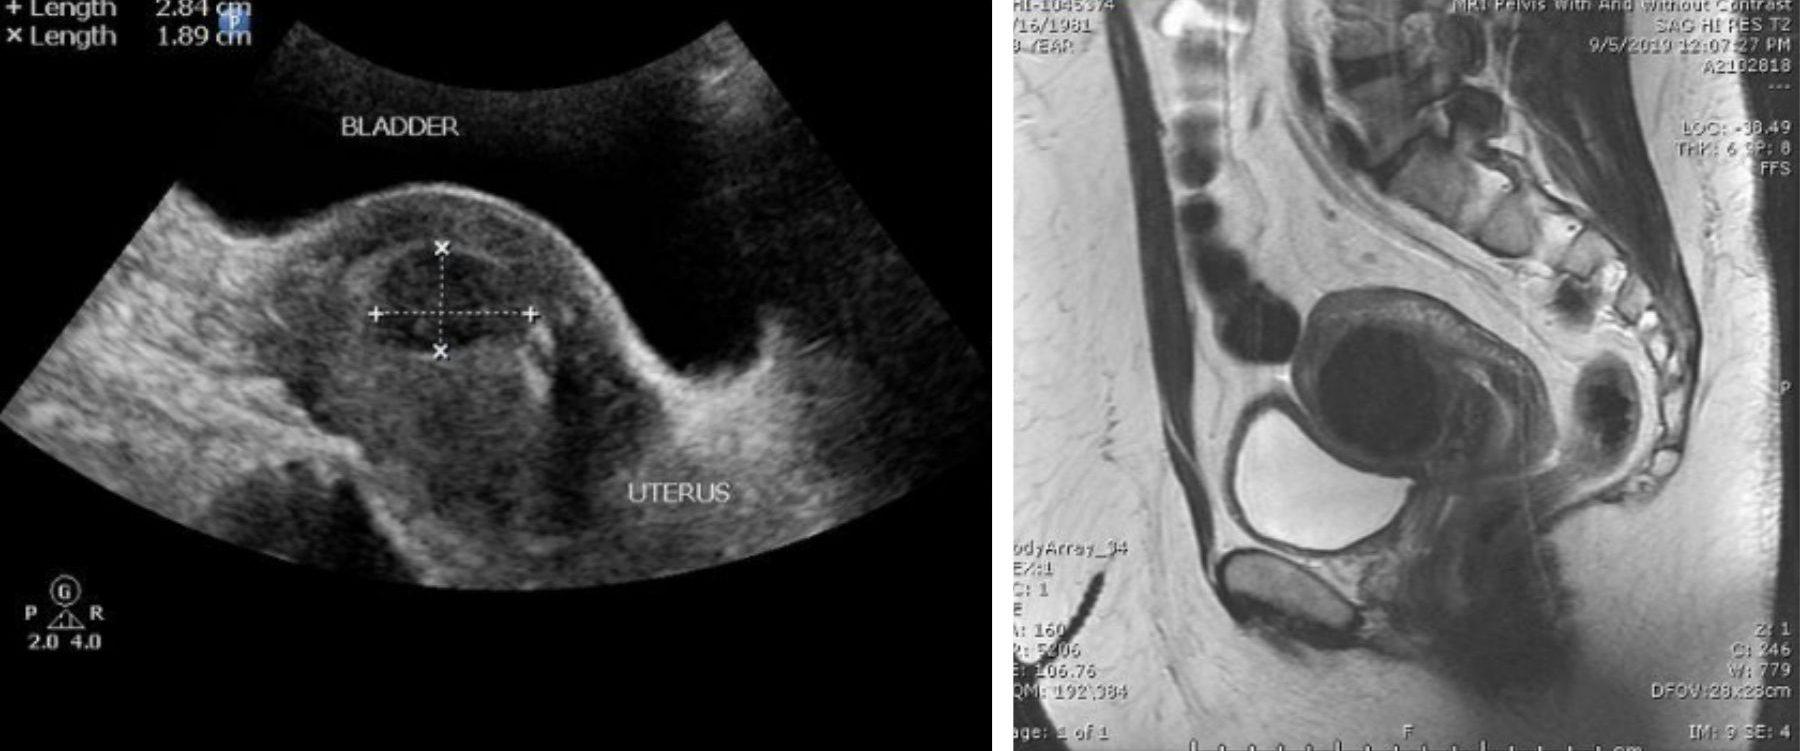 pelvic ultrasound vs pelvic MRI